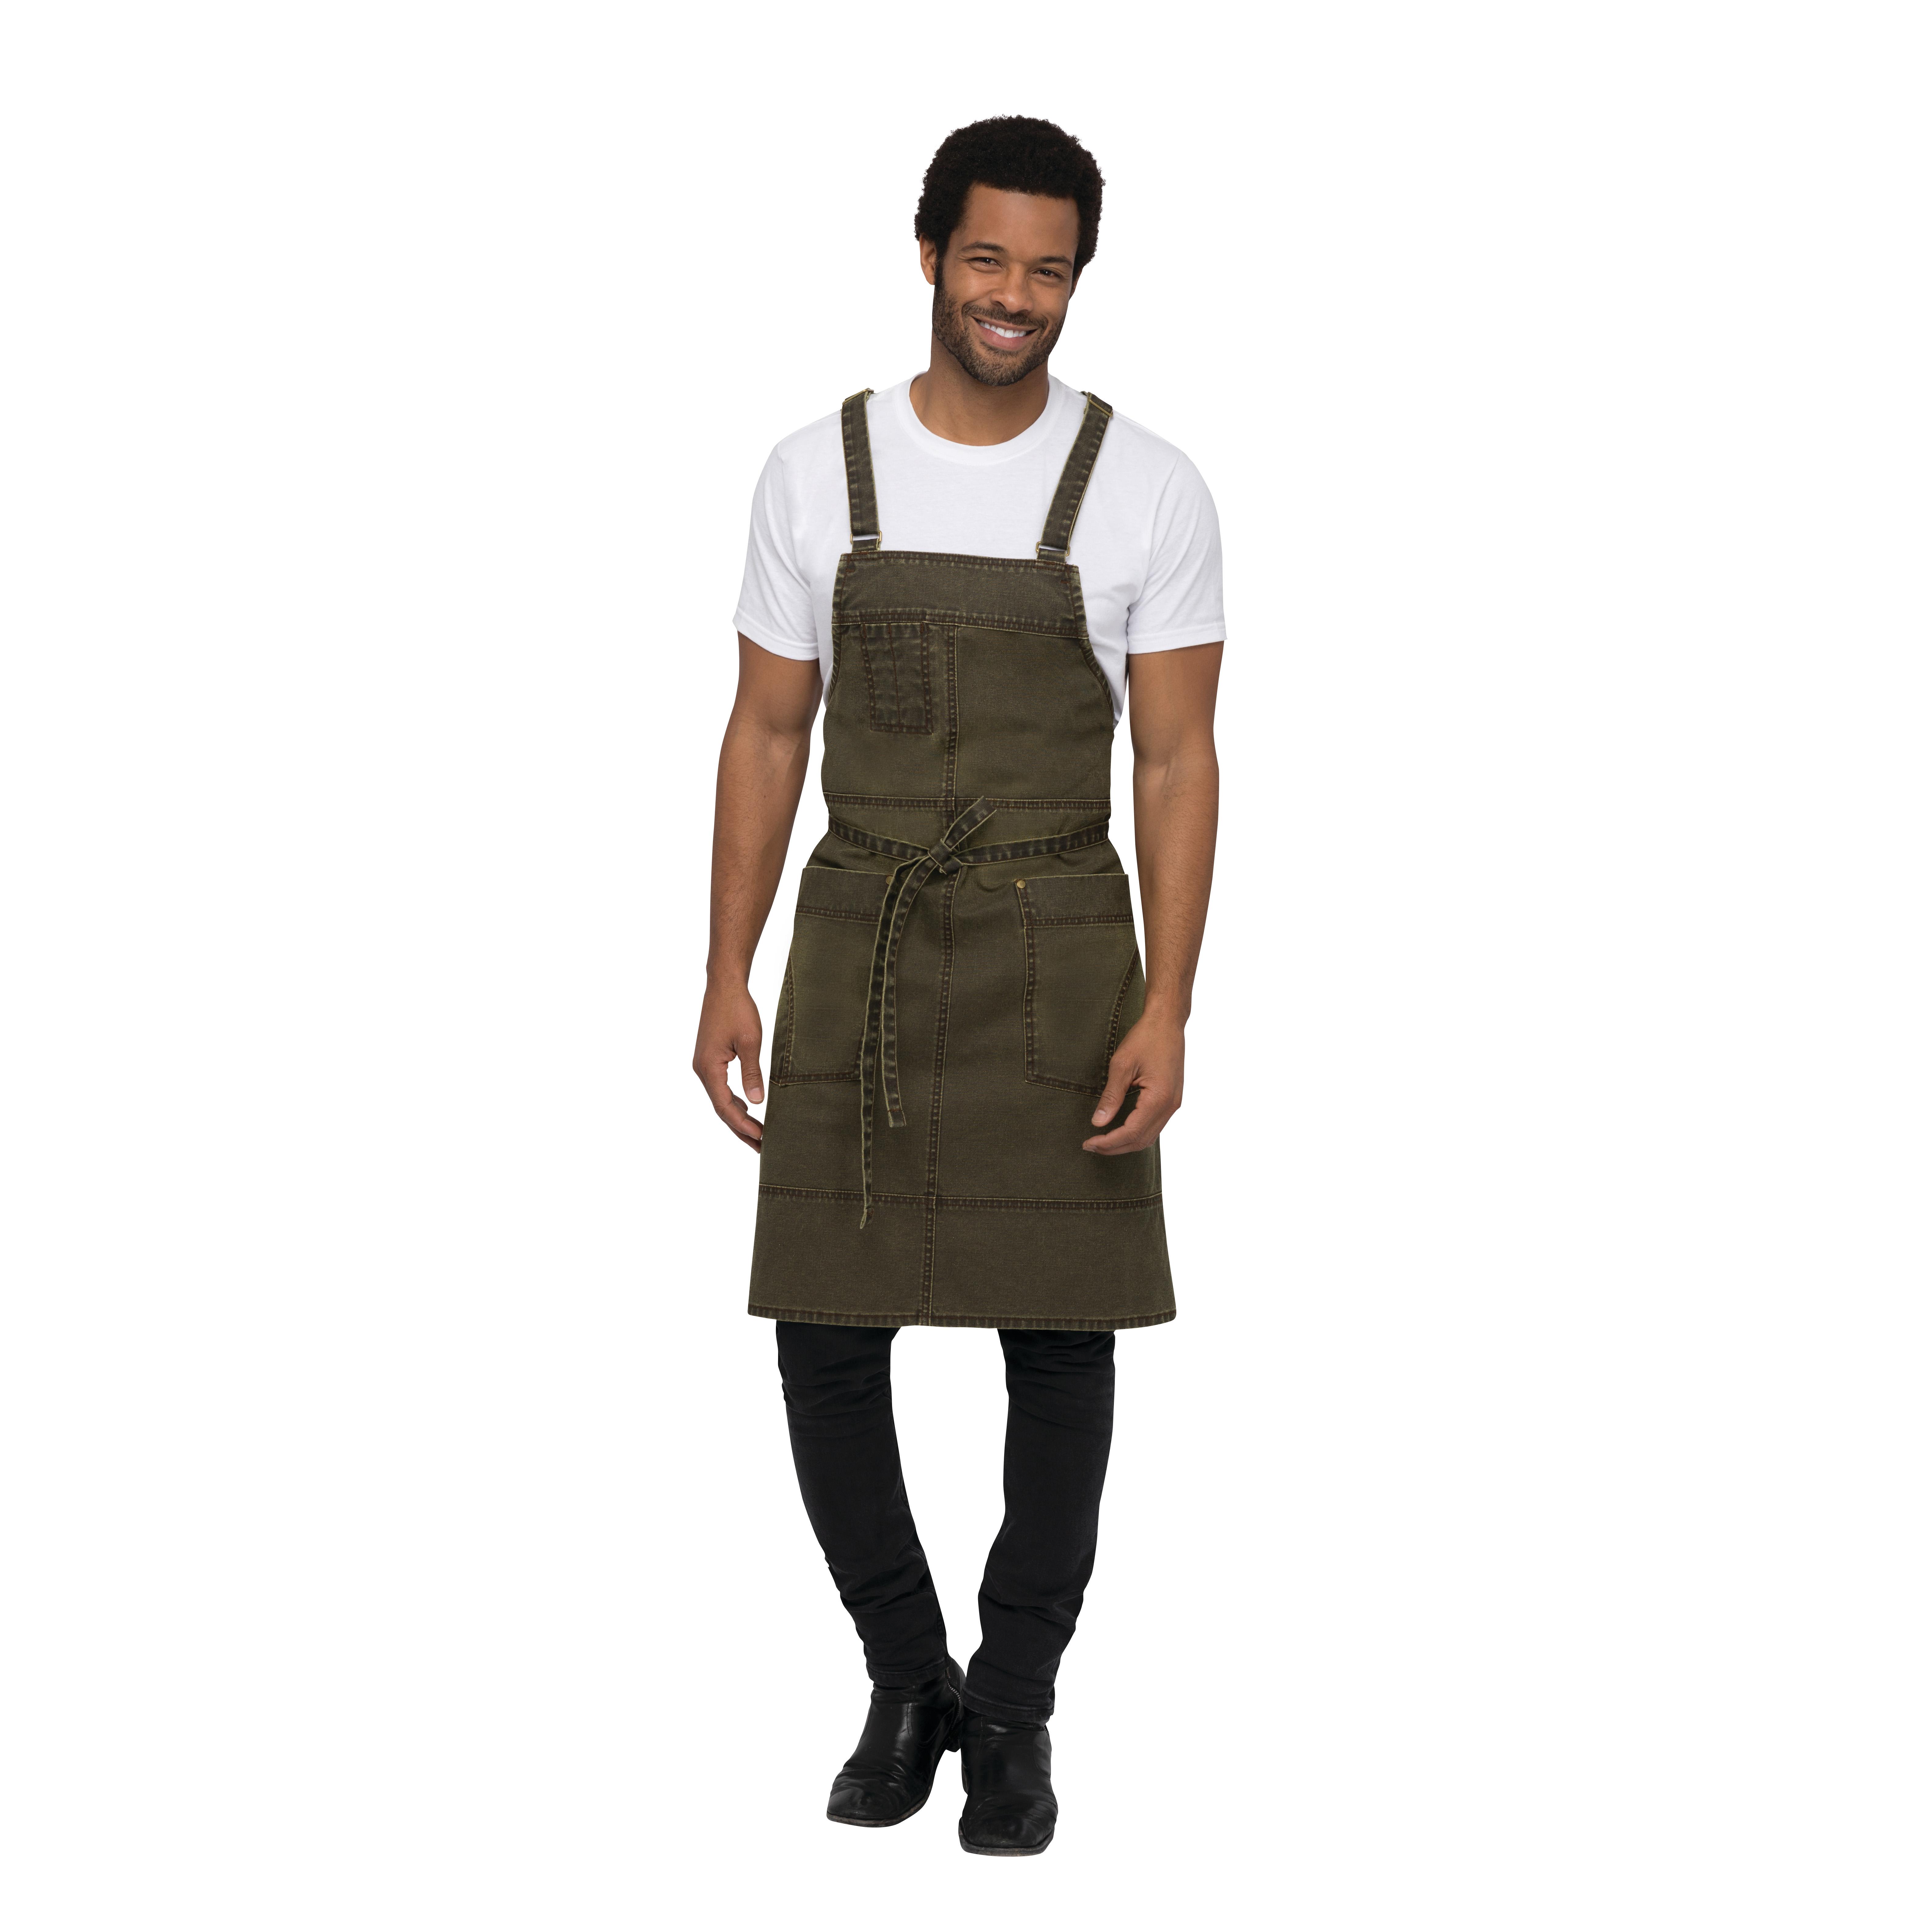 Chef Works ABX04MAI0 bib apron